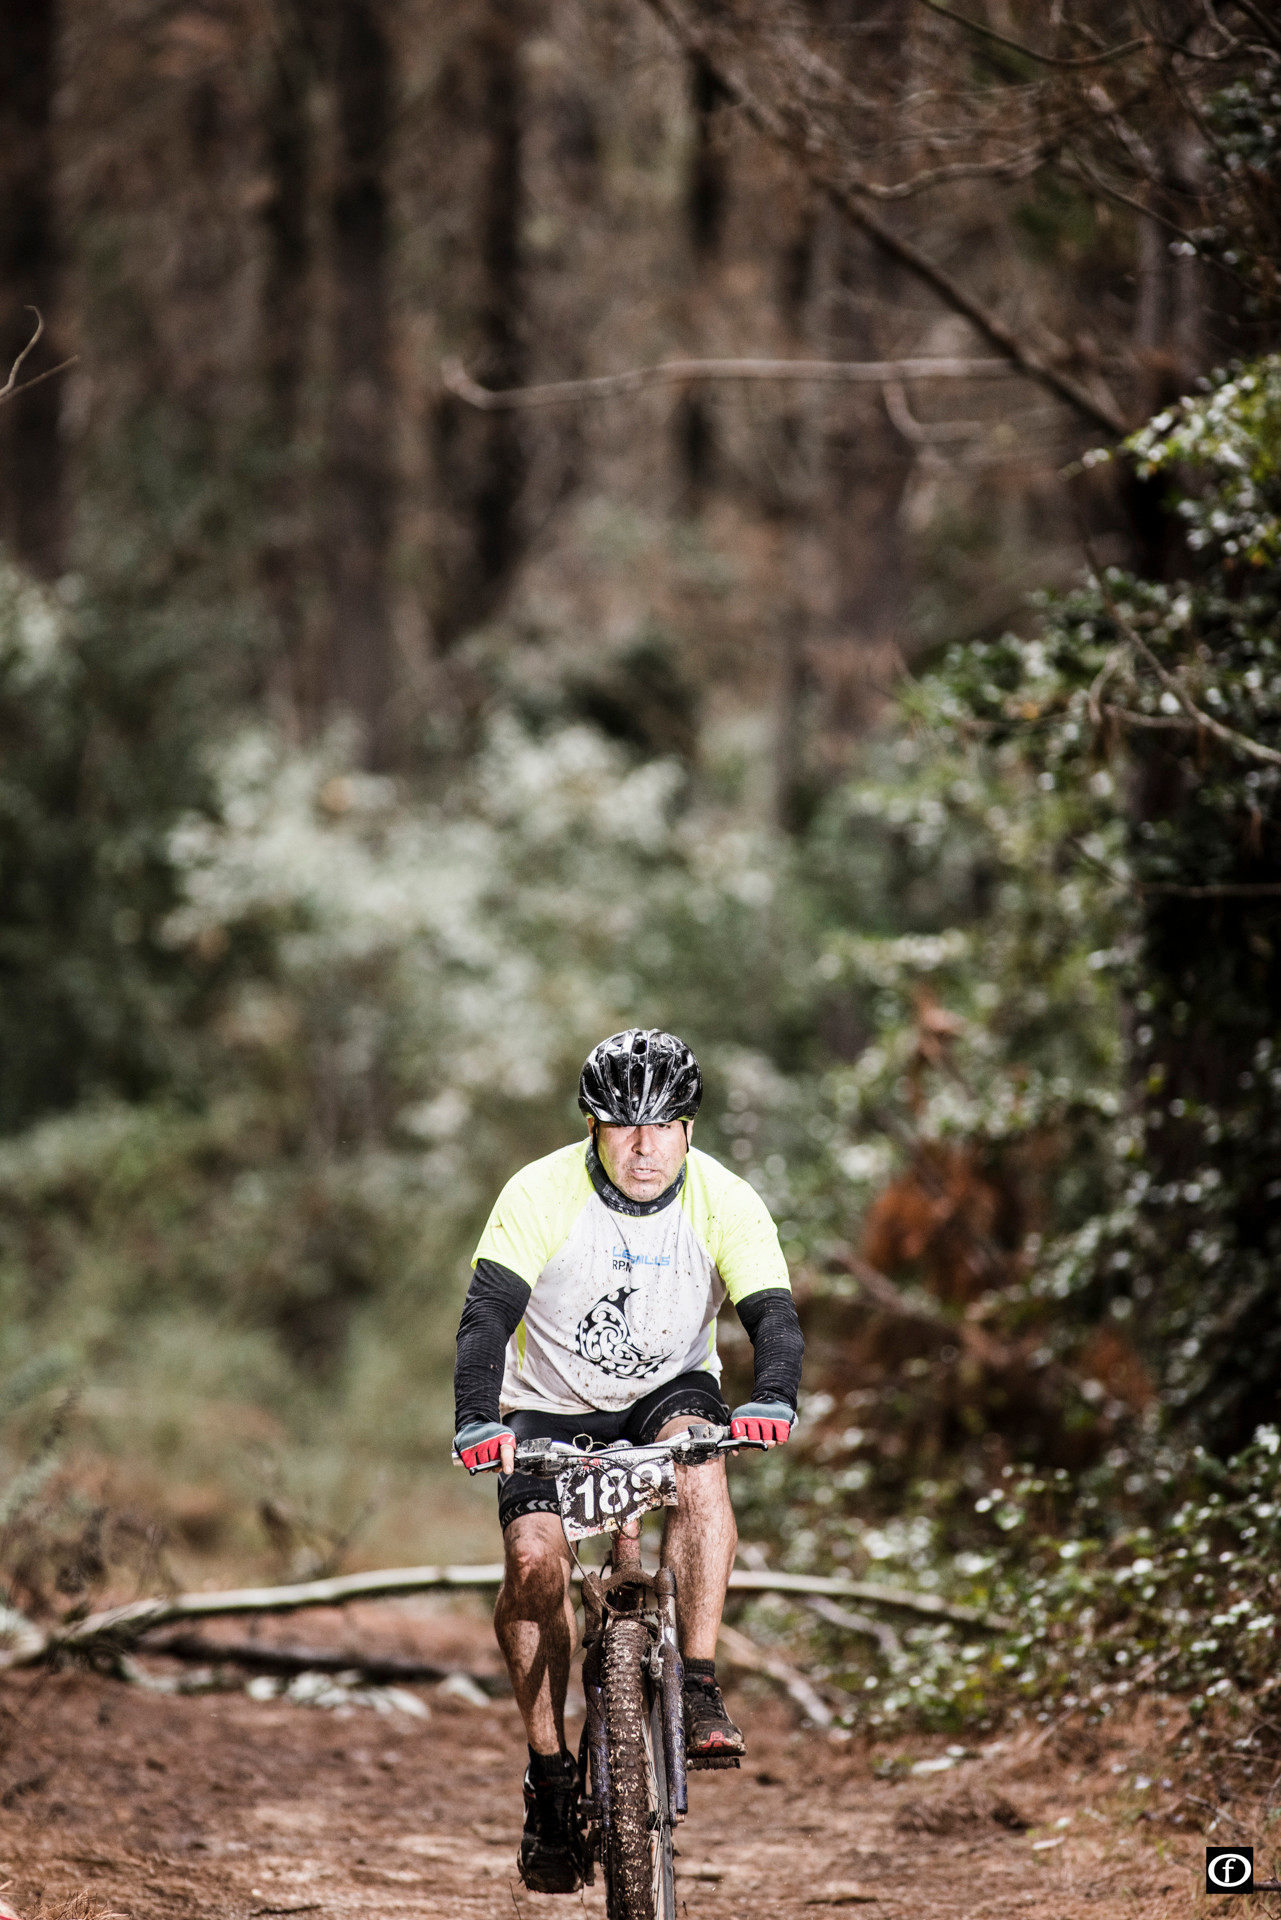 2015-05-17-Ciclismo Enduro-67.jpg